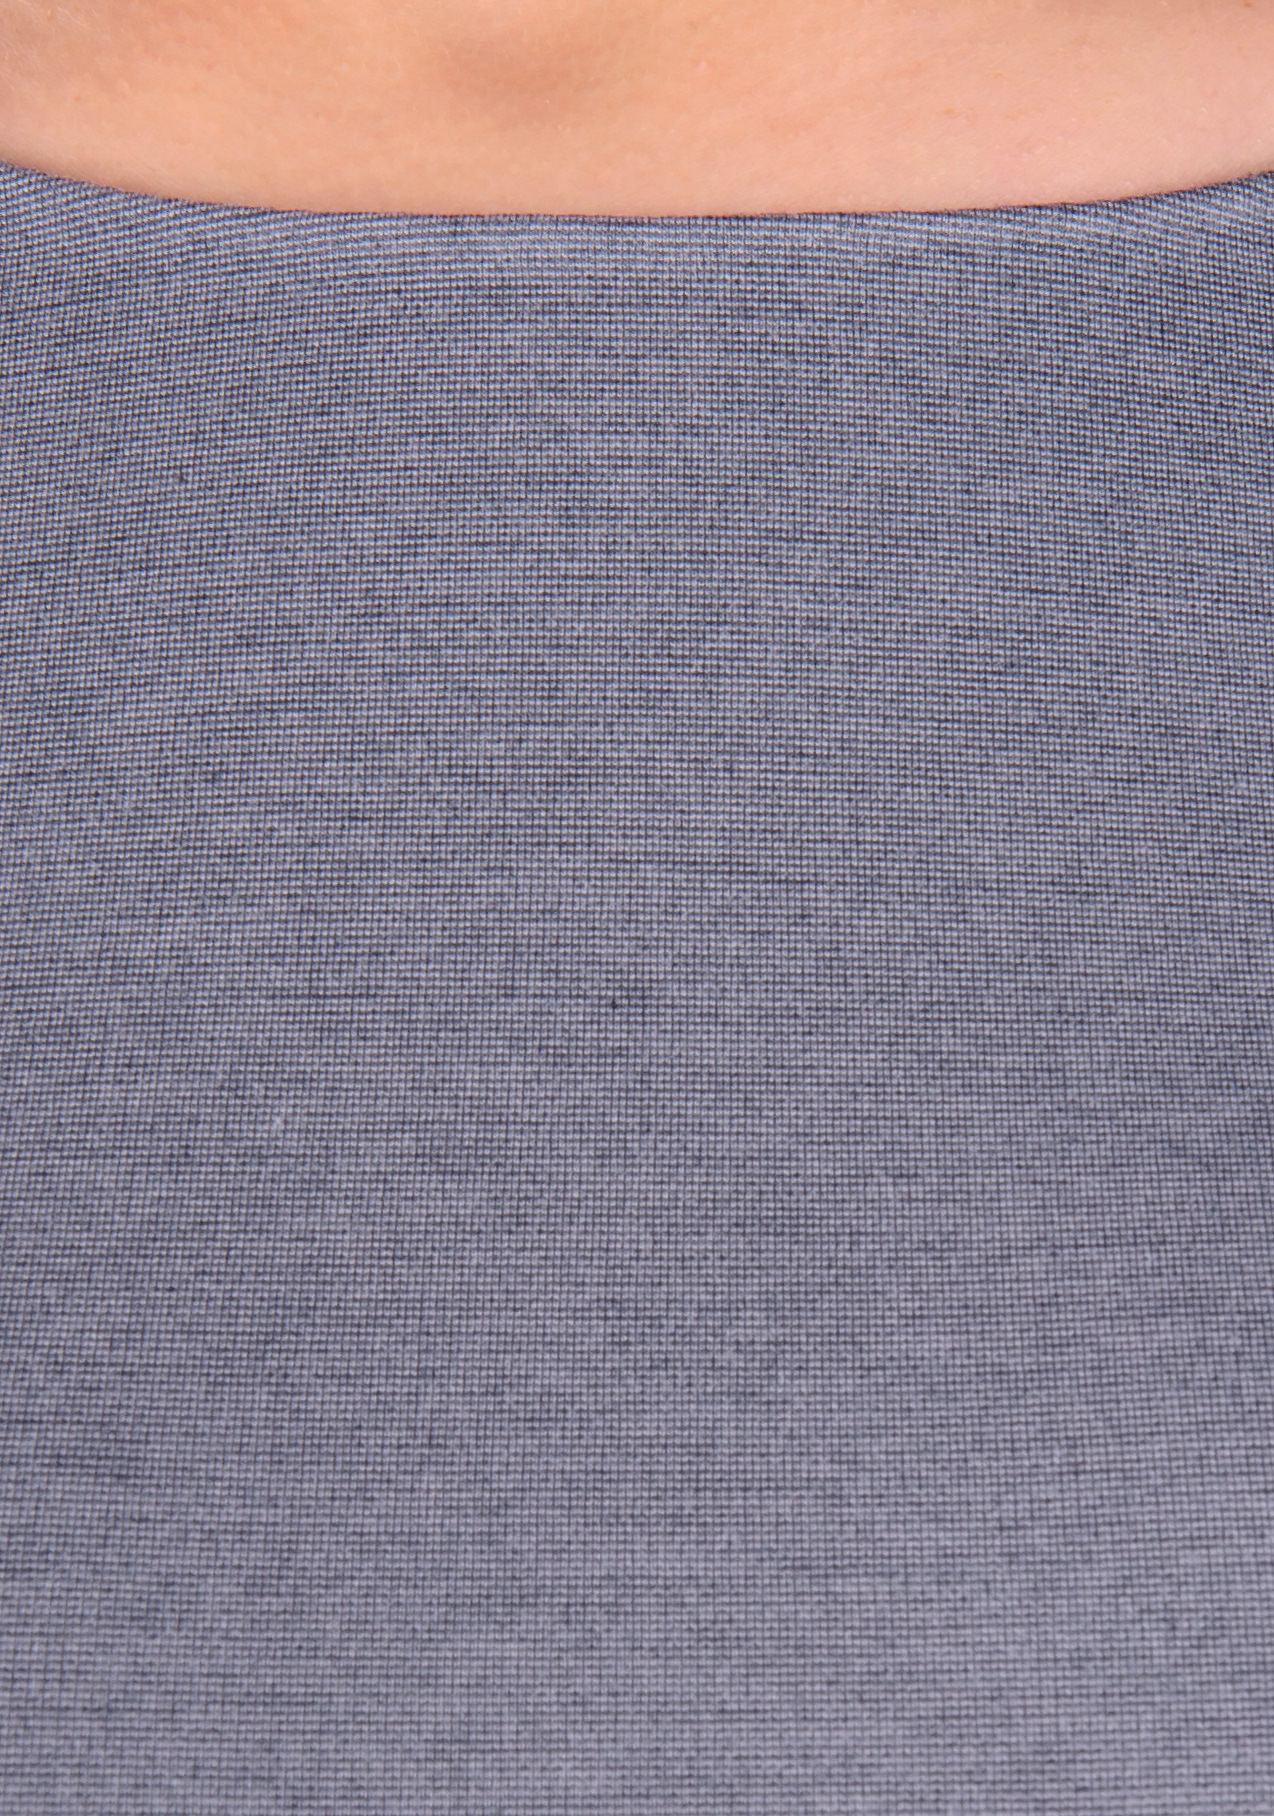 Платье Блэйк 4528 Цвет: Серый